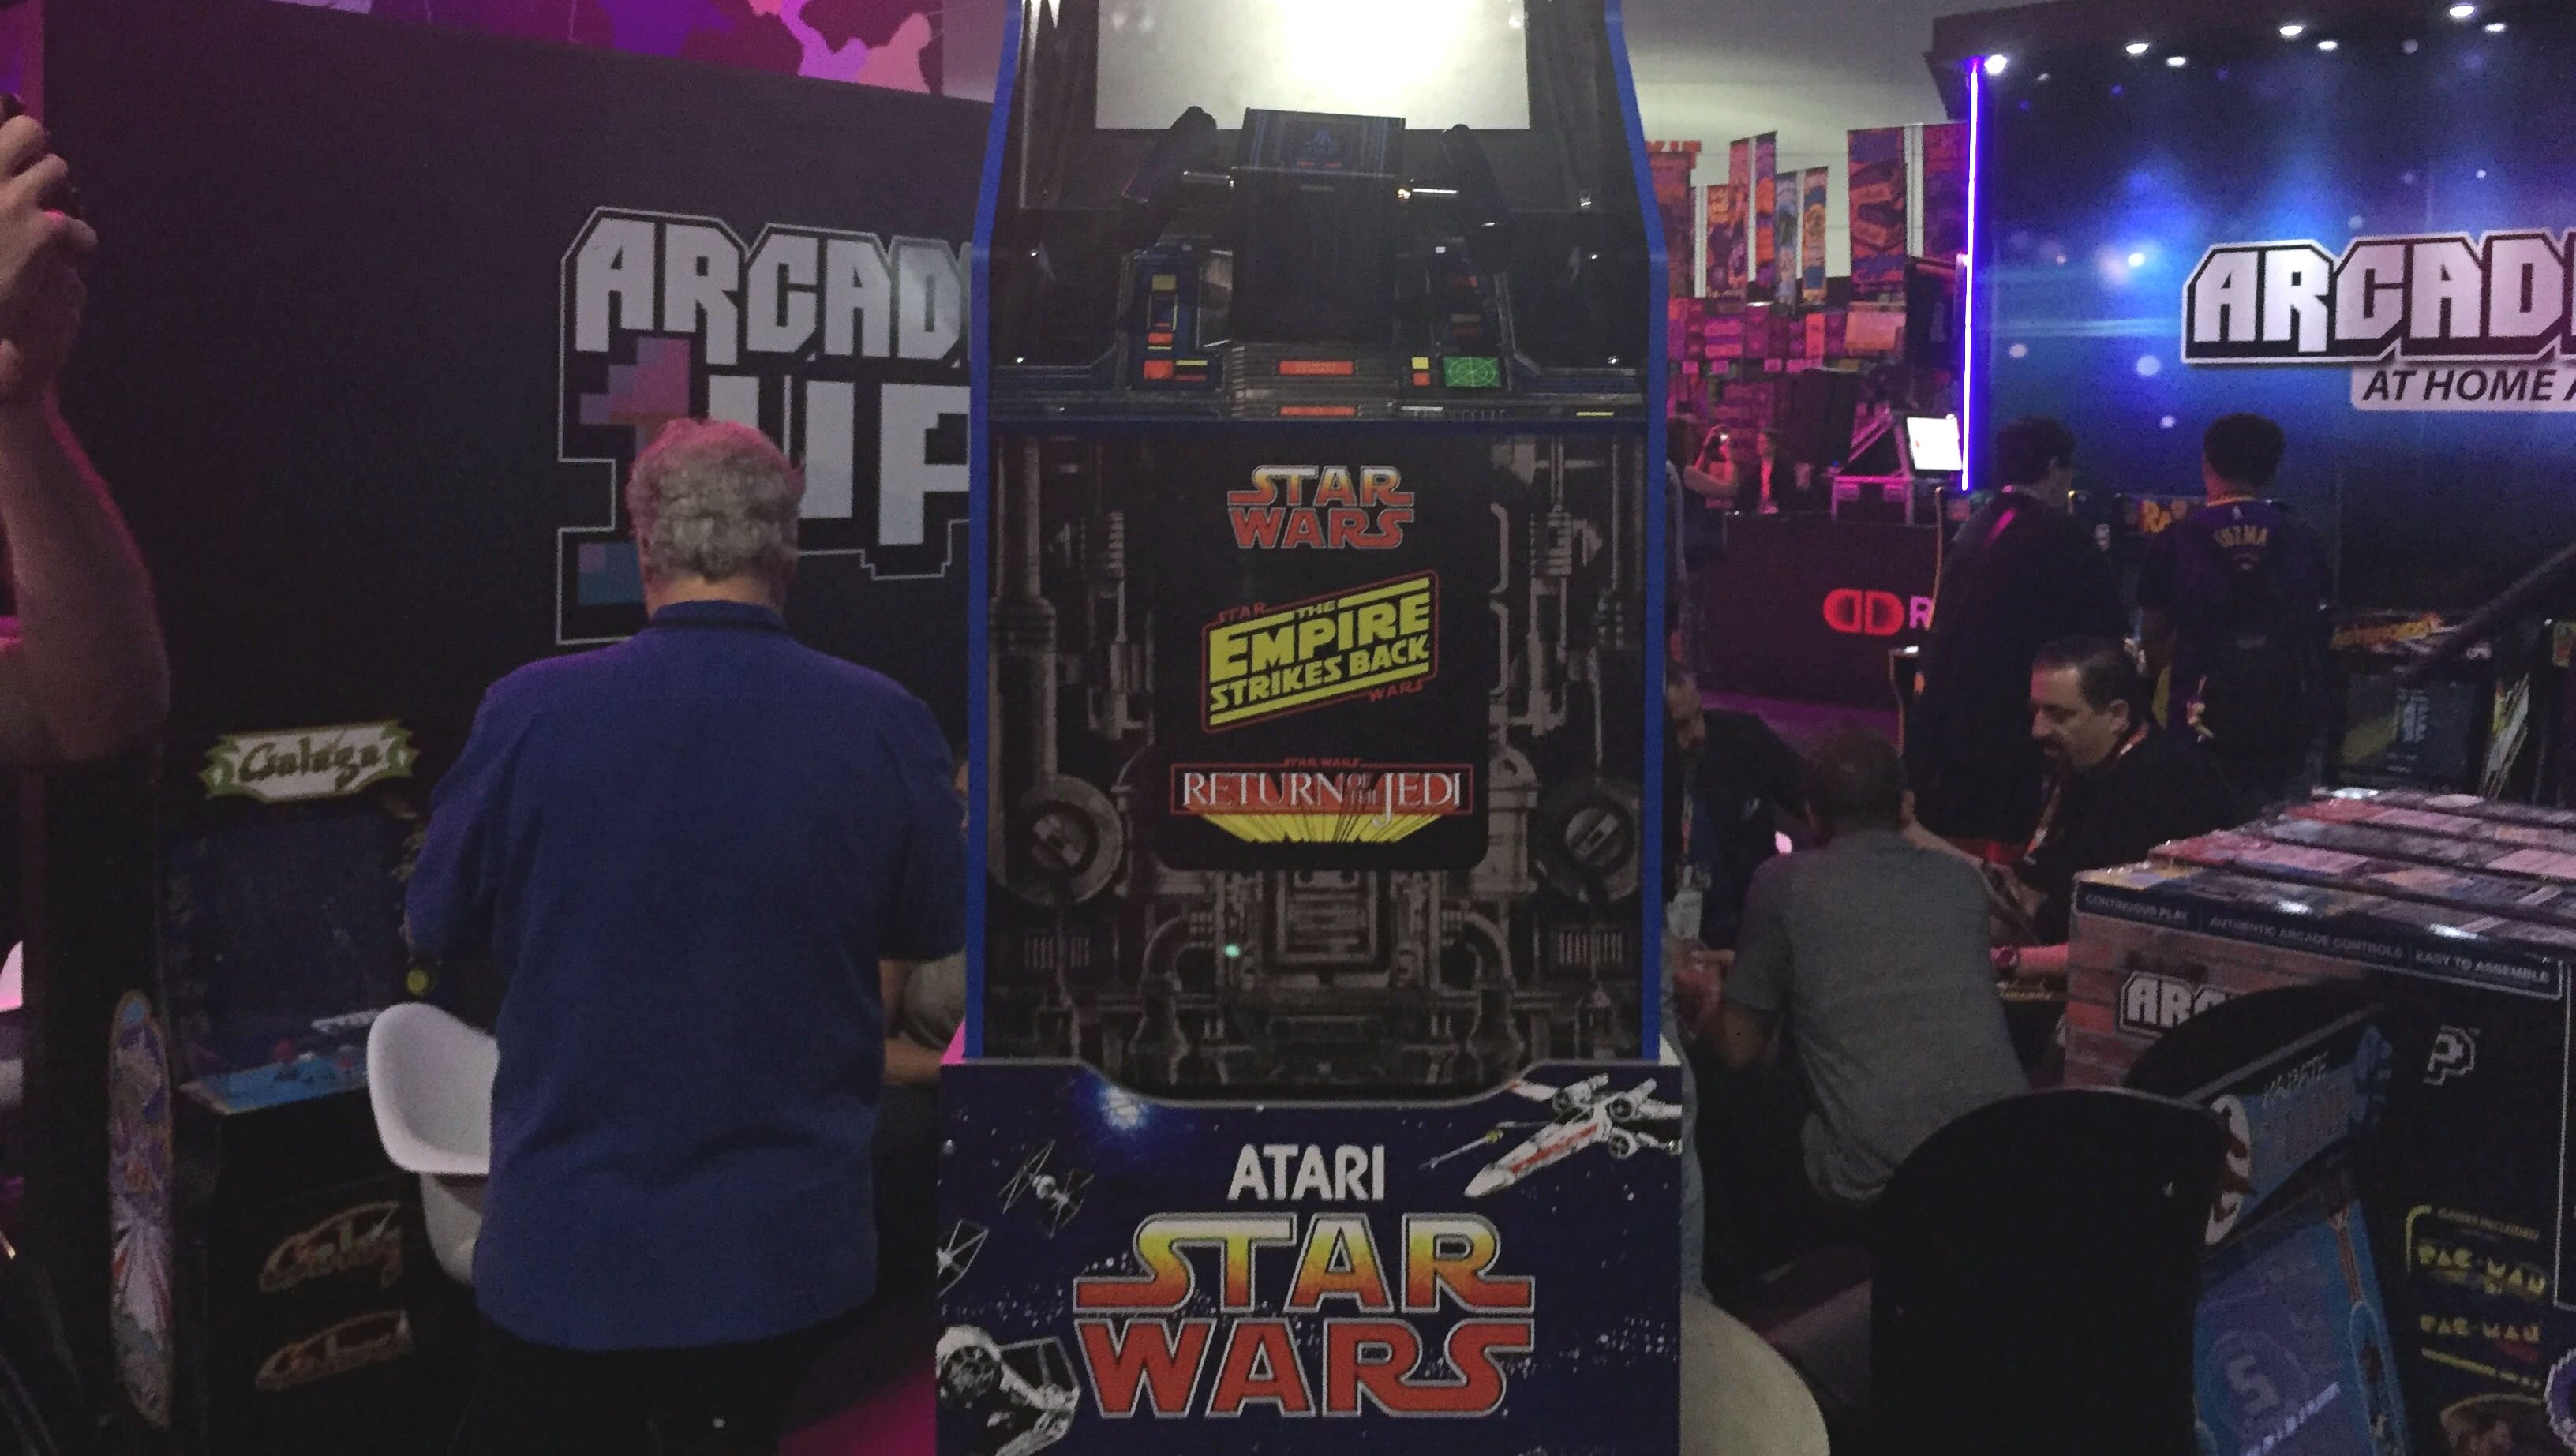 Arcade1Up unveils Star Wars arcade cabinet at E3 2019 | Shacknews